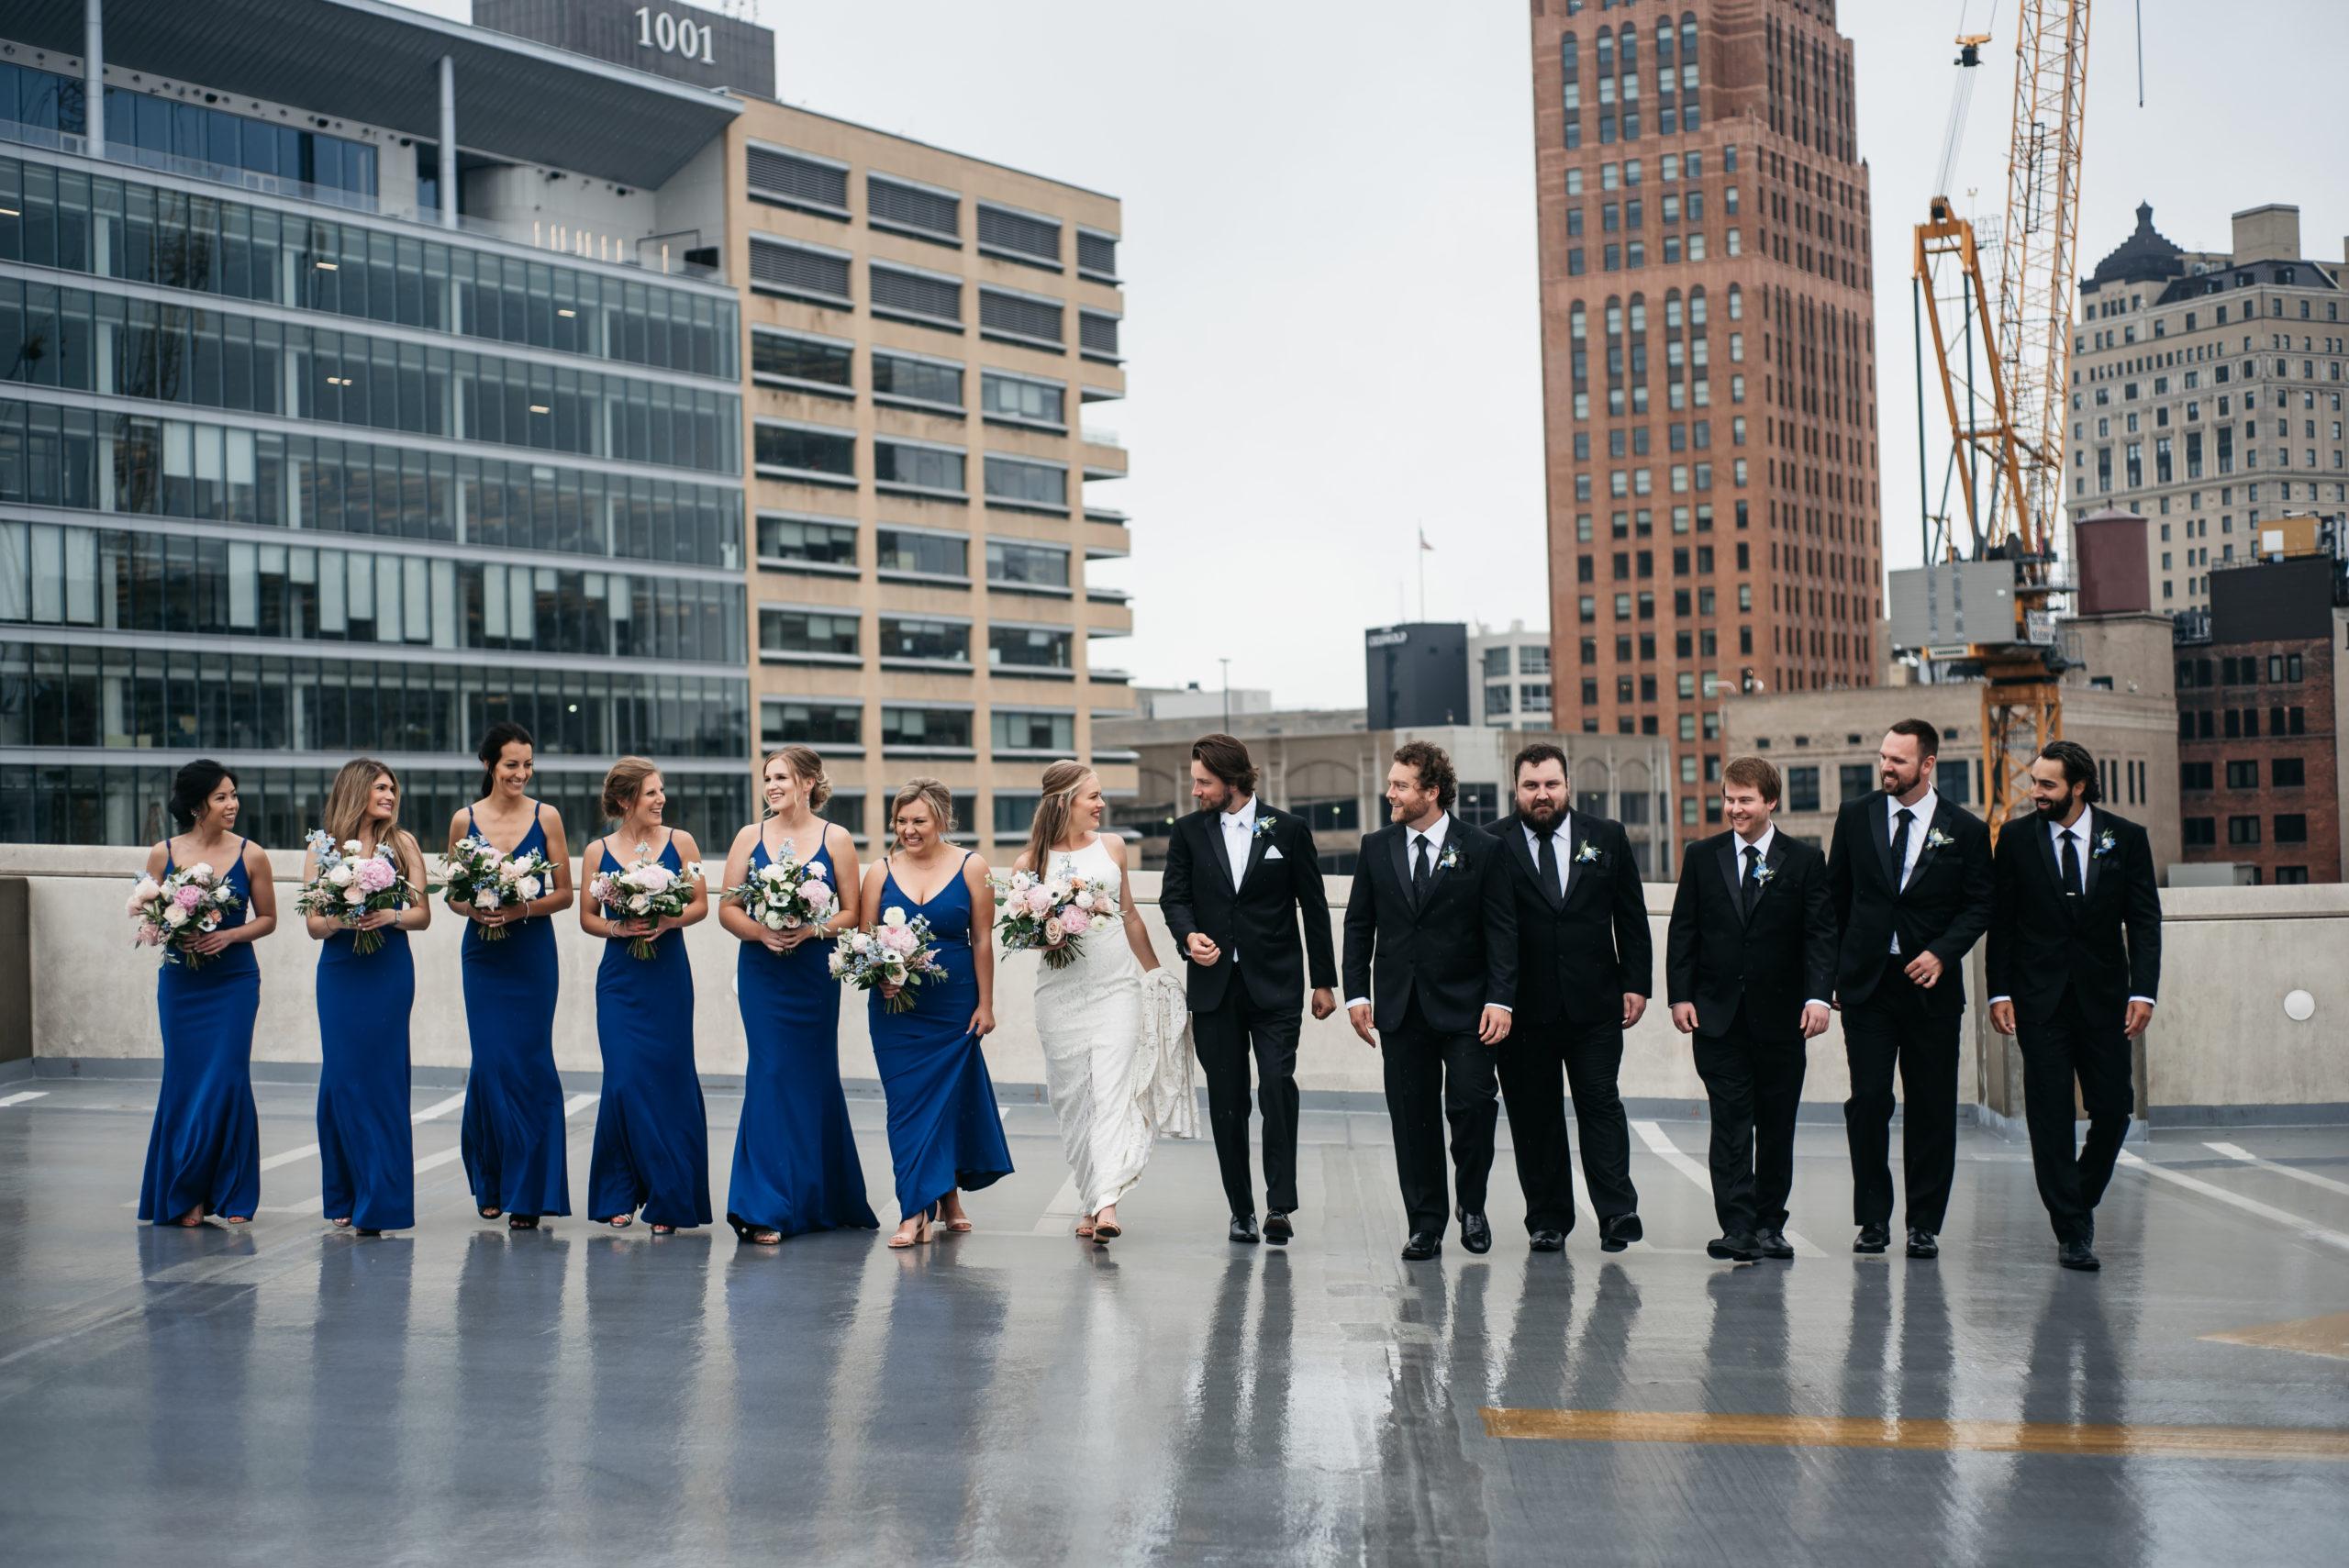 Big City Wedding - The View